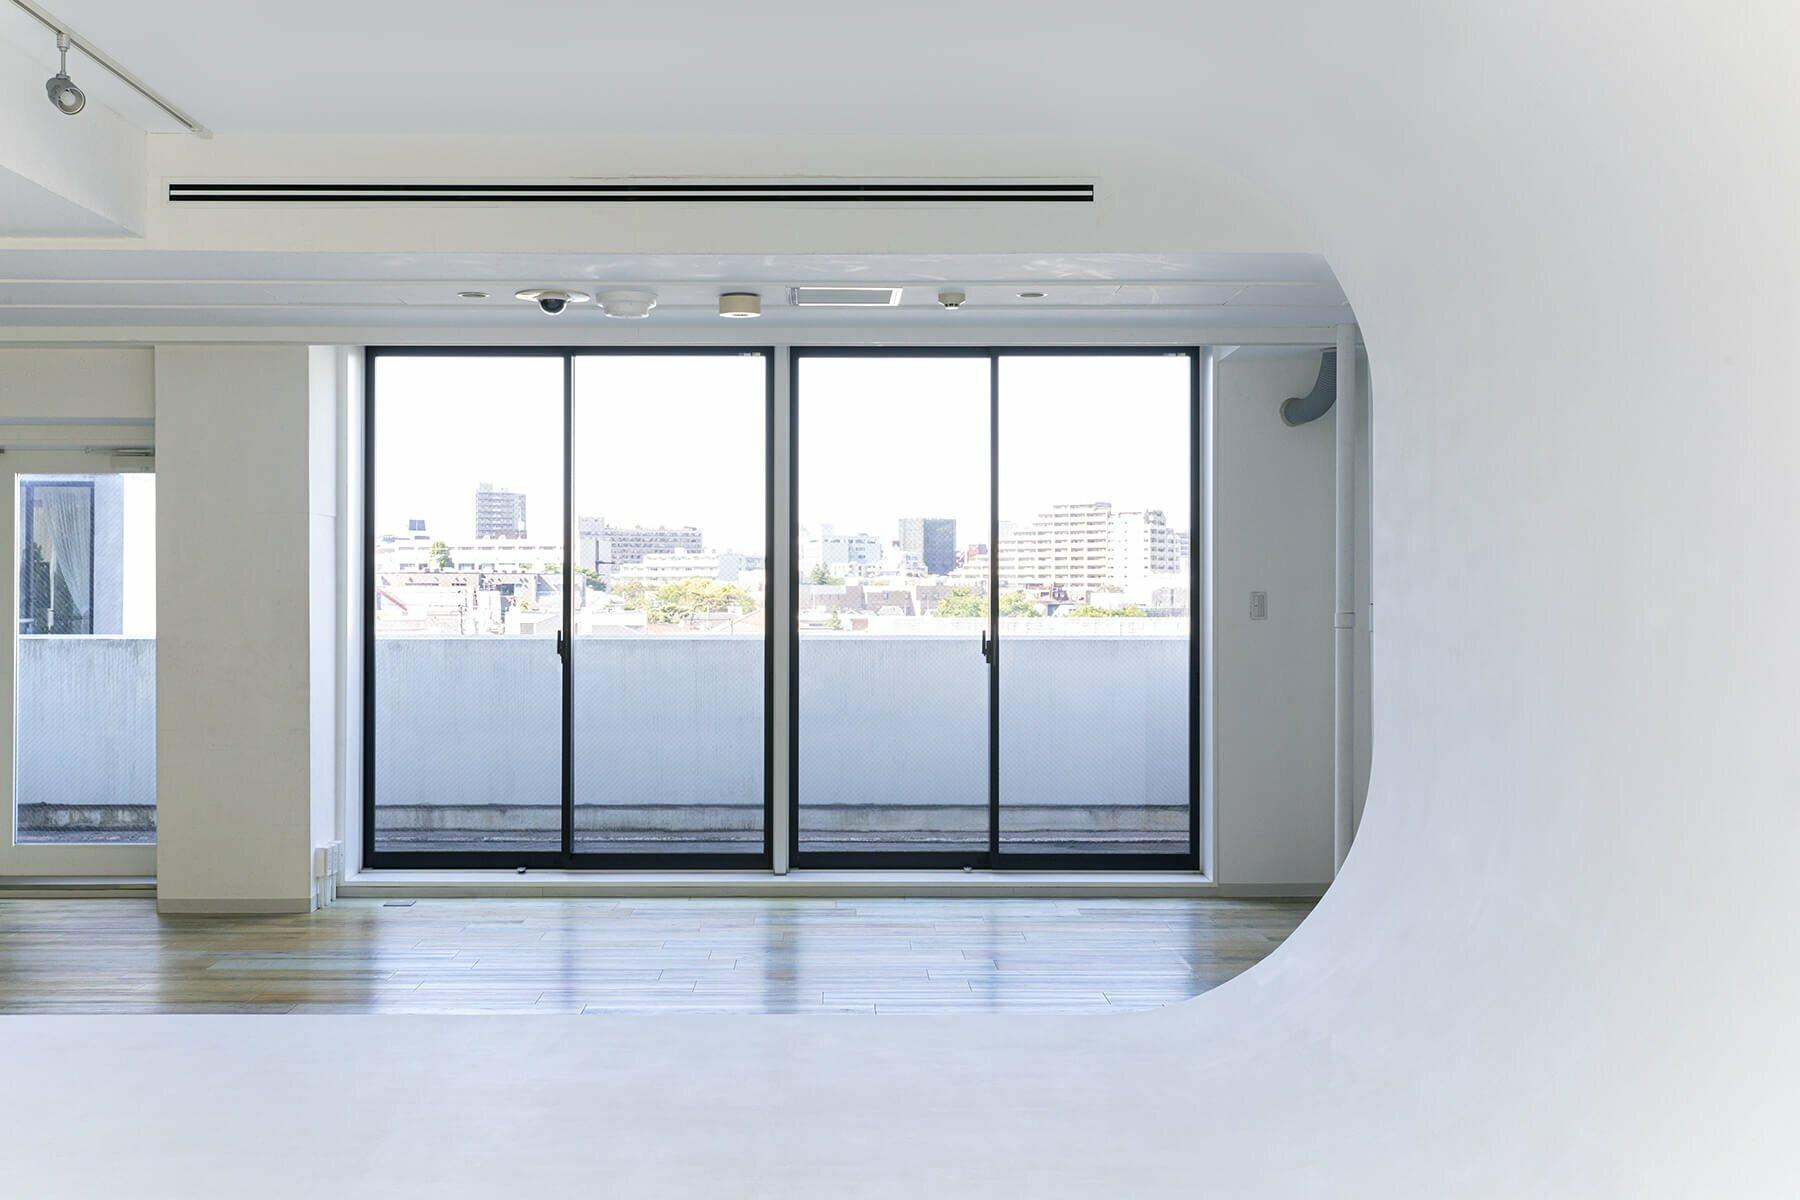 Studio TERRANOVA Bst  白ホリ+ハウススタジオ  (スタジオテラノヴァ)幅4mの格子窓 / 南方角